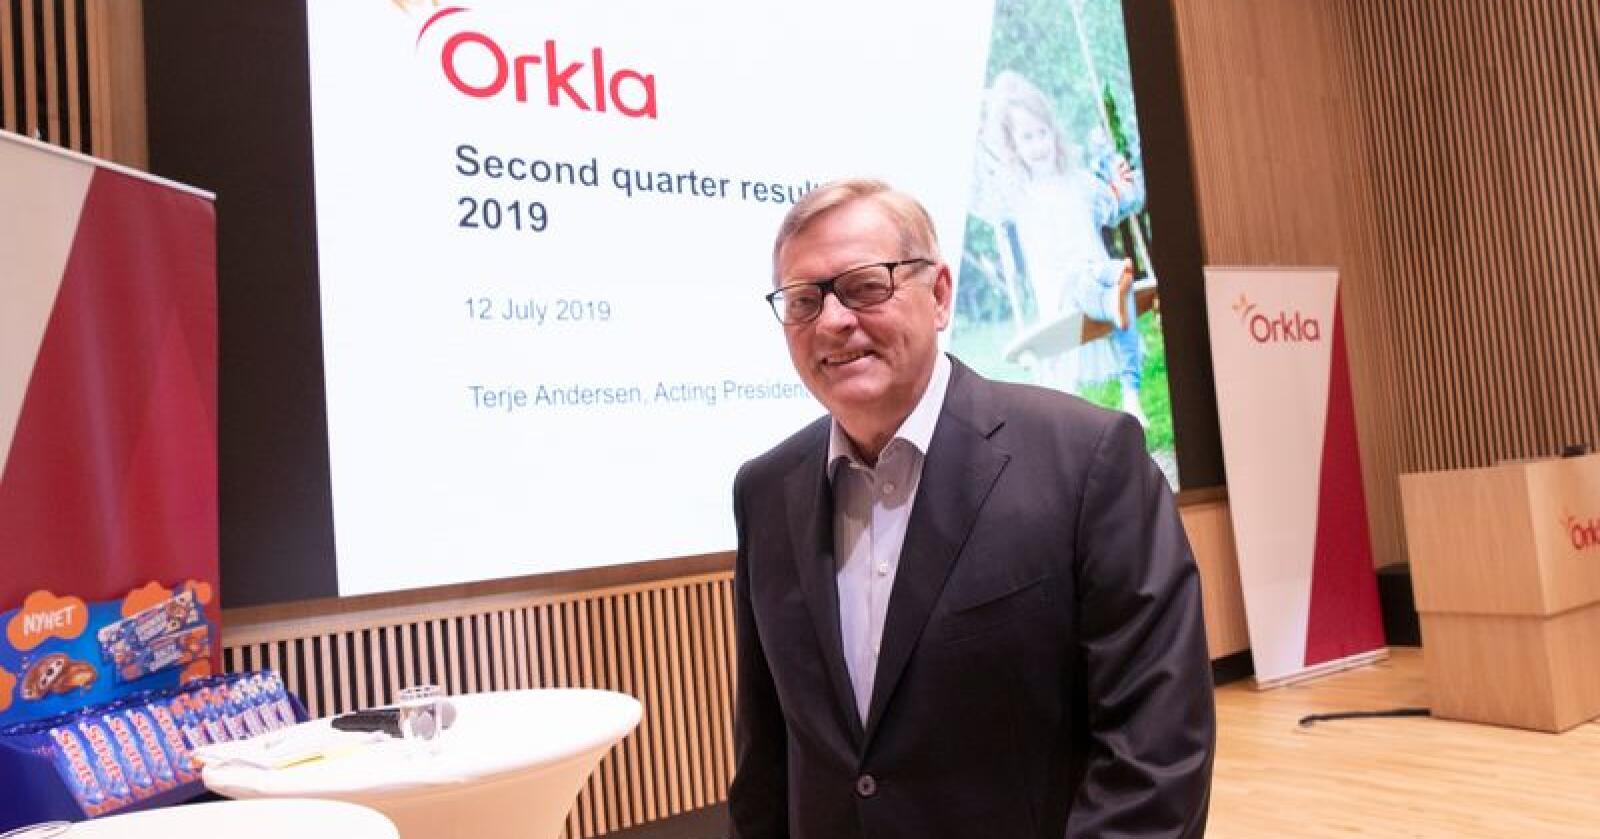 Konserndirektør Terje Andersen under presentasjonen Orklas resultater for 2. kvartal Foto: Terje Bendiksby / NTB scanpix